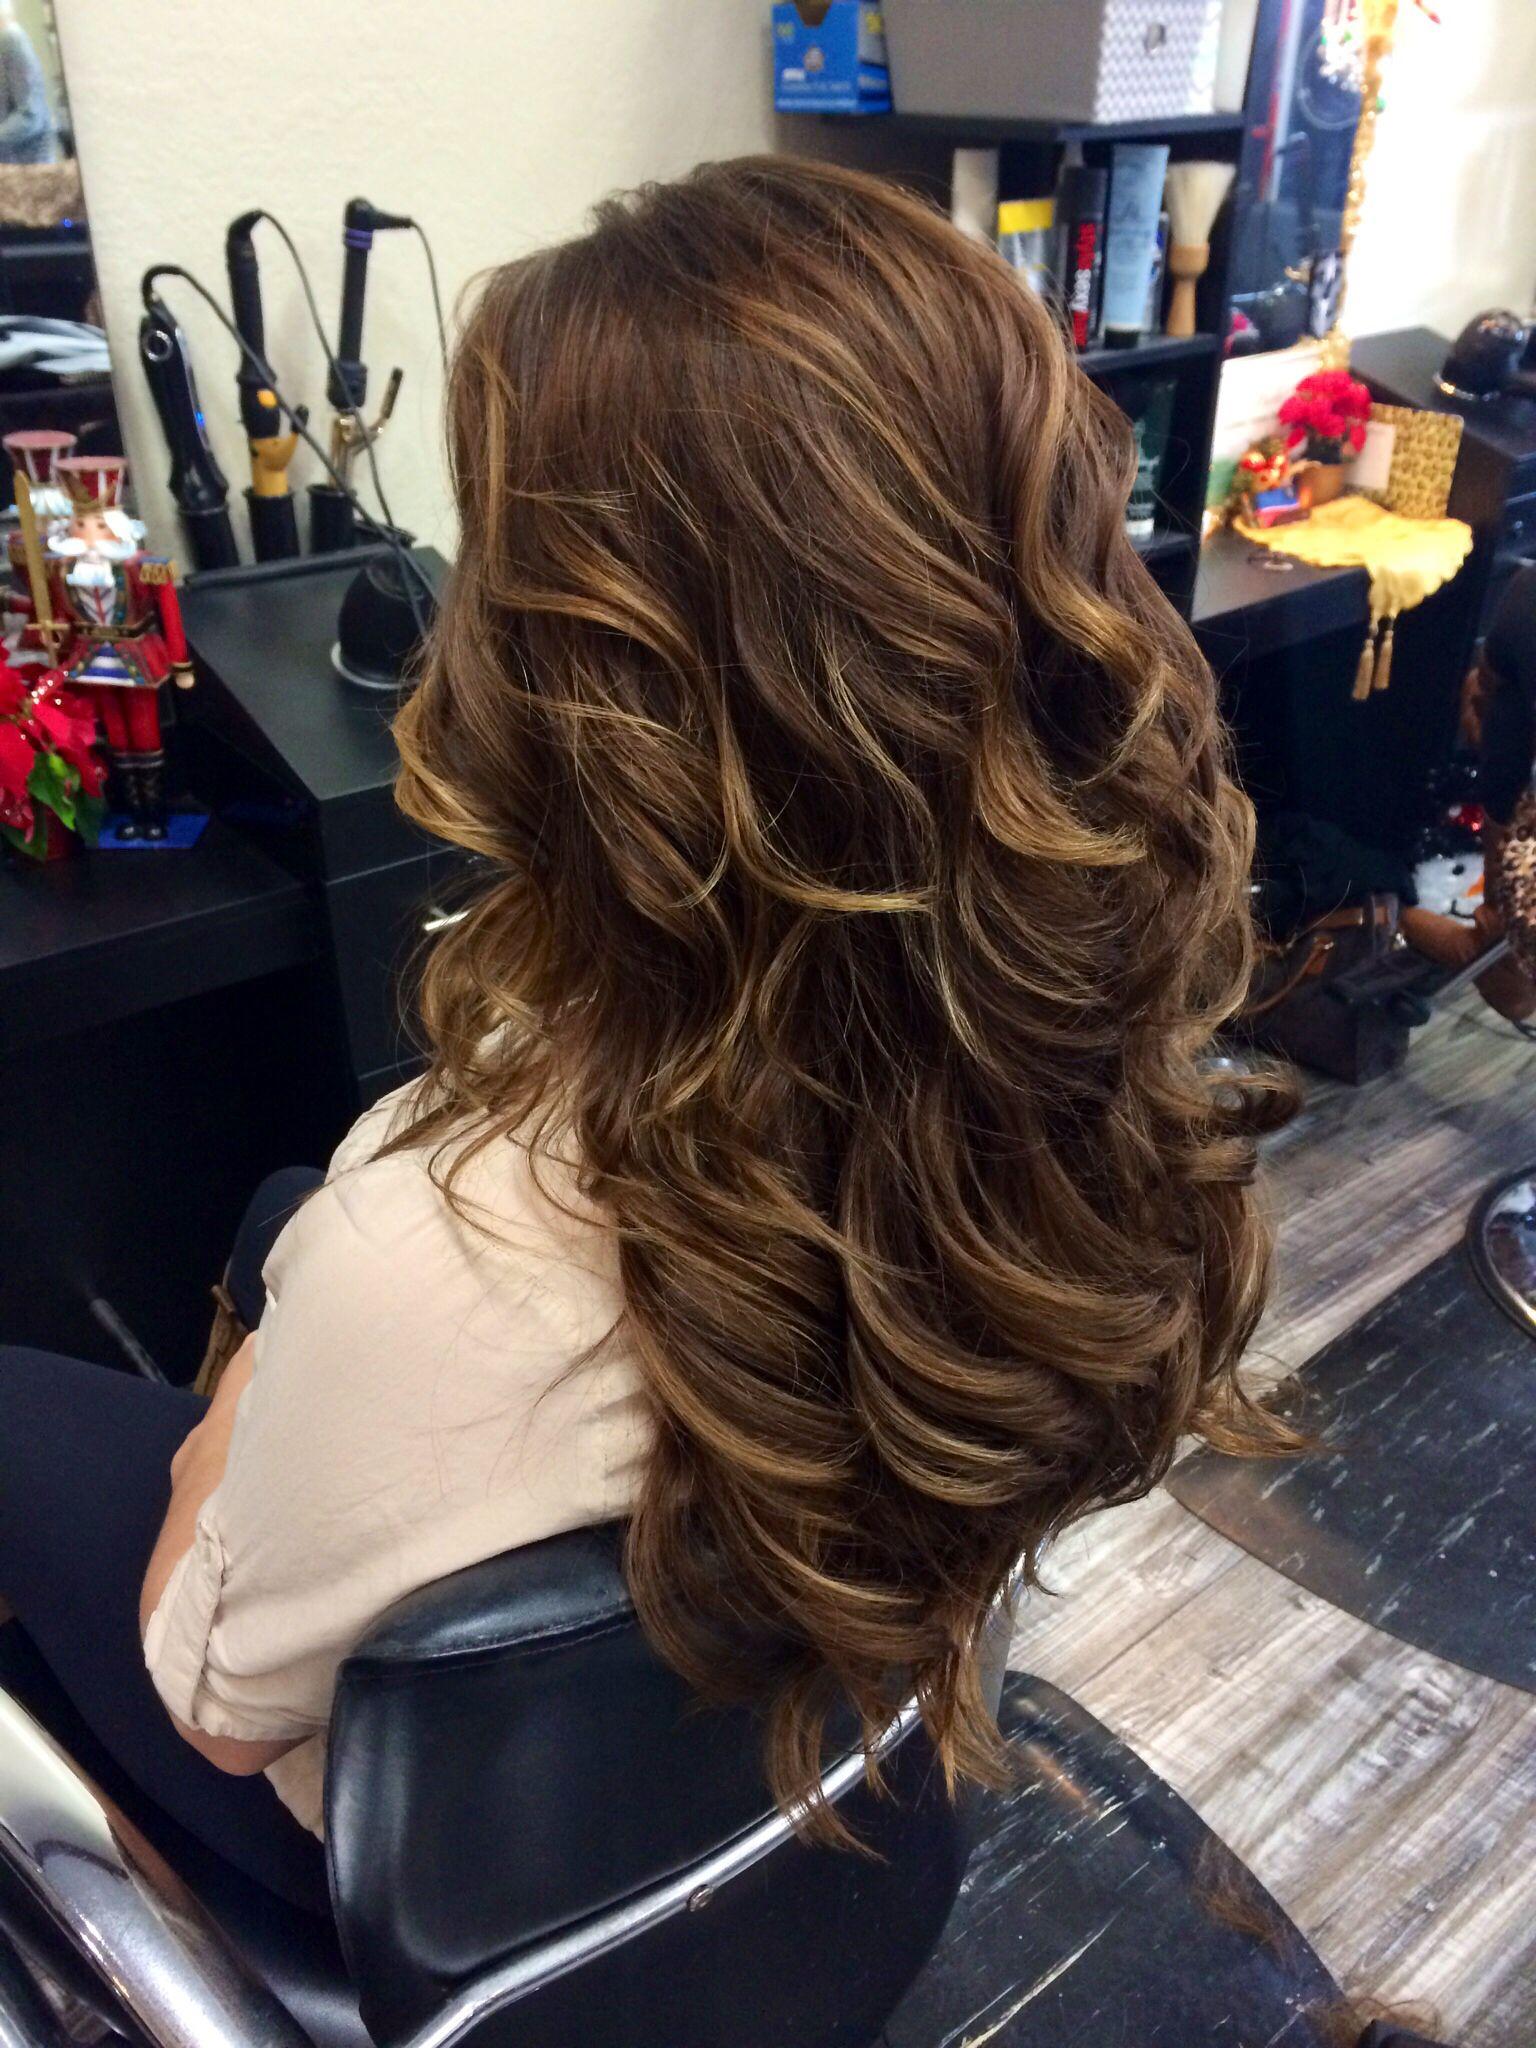 Natural Balayage Highlights Long Brown Hair With Highlights Curls Haircut Hair By Jayleen The Natural Hair Styles Natural Hair Salons Celebrity Hair Salon